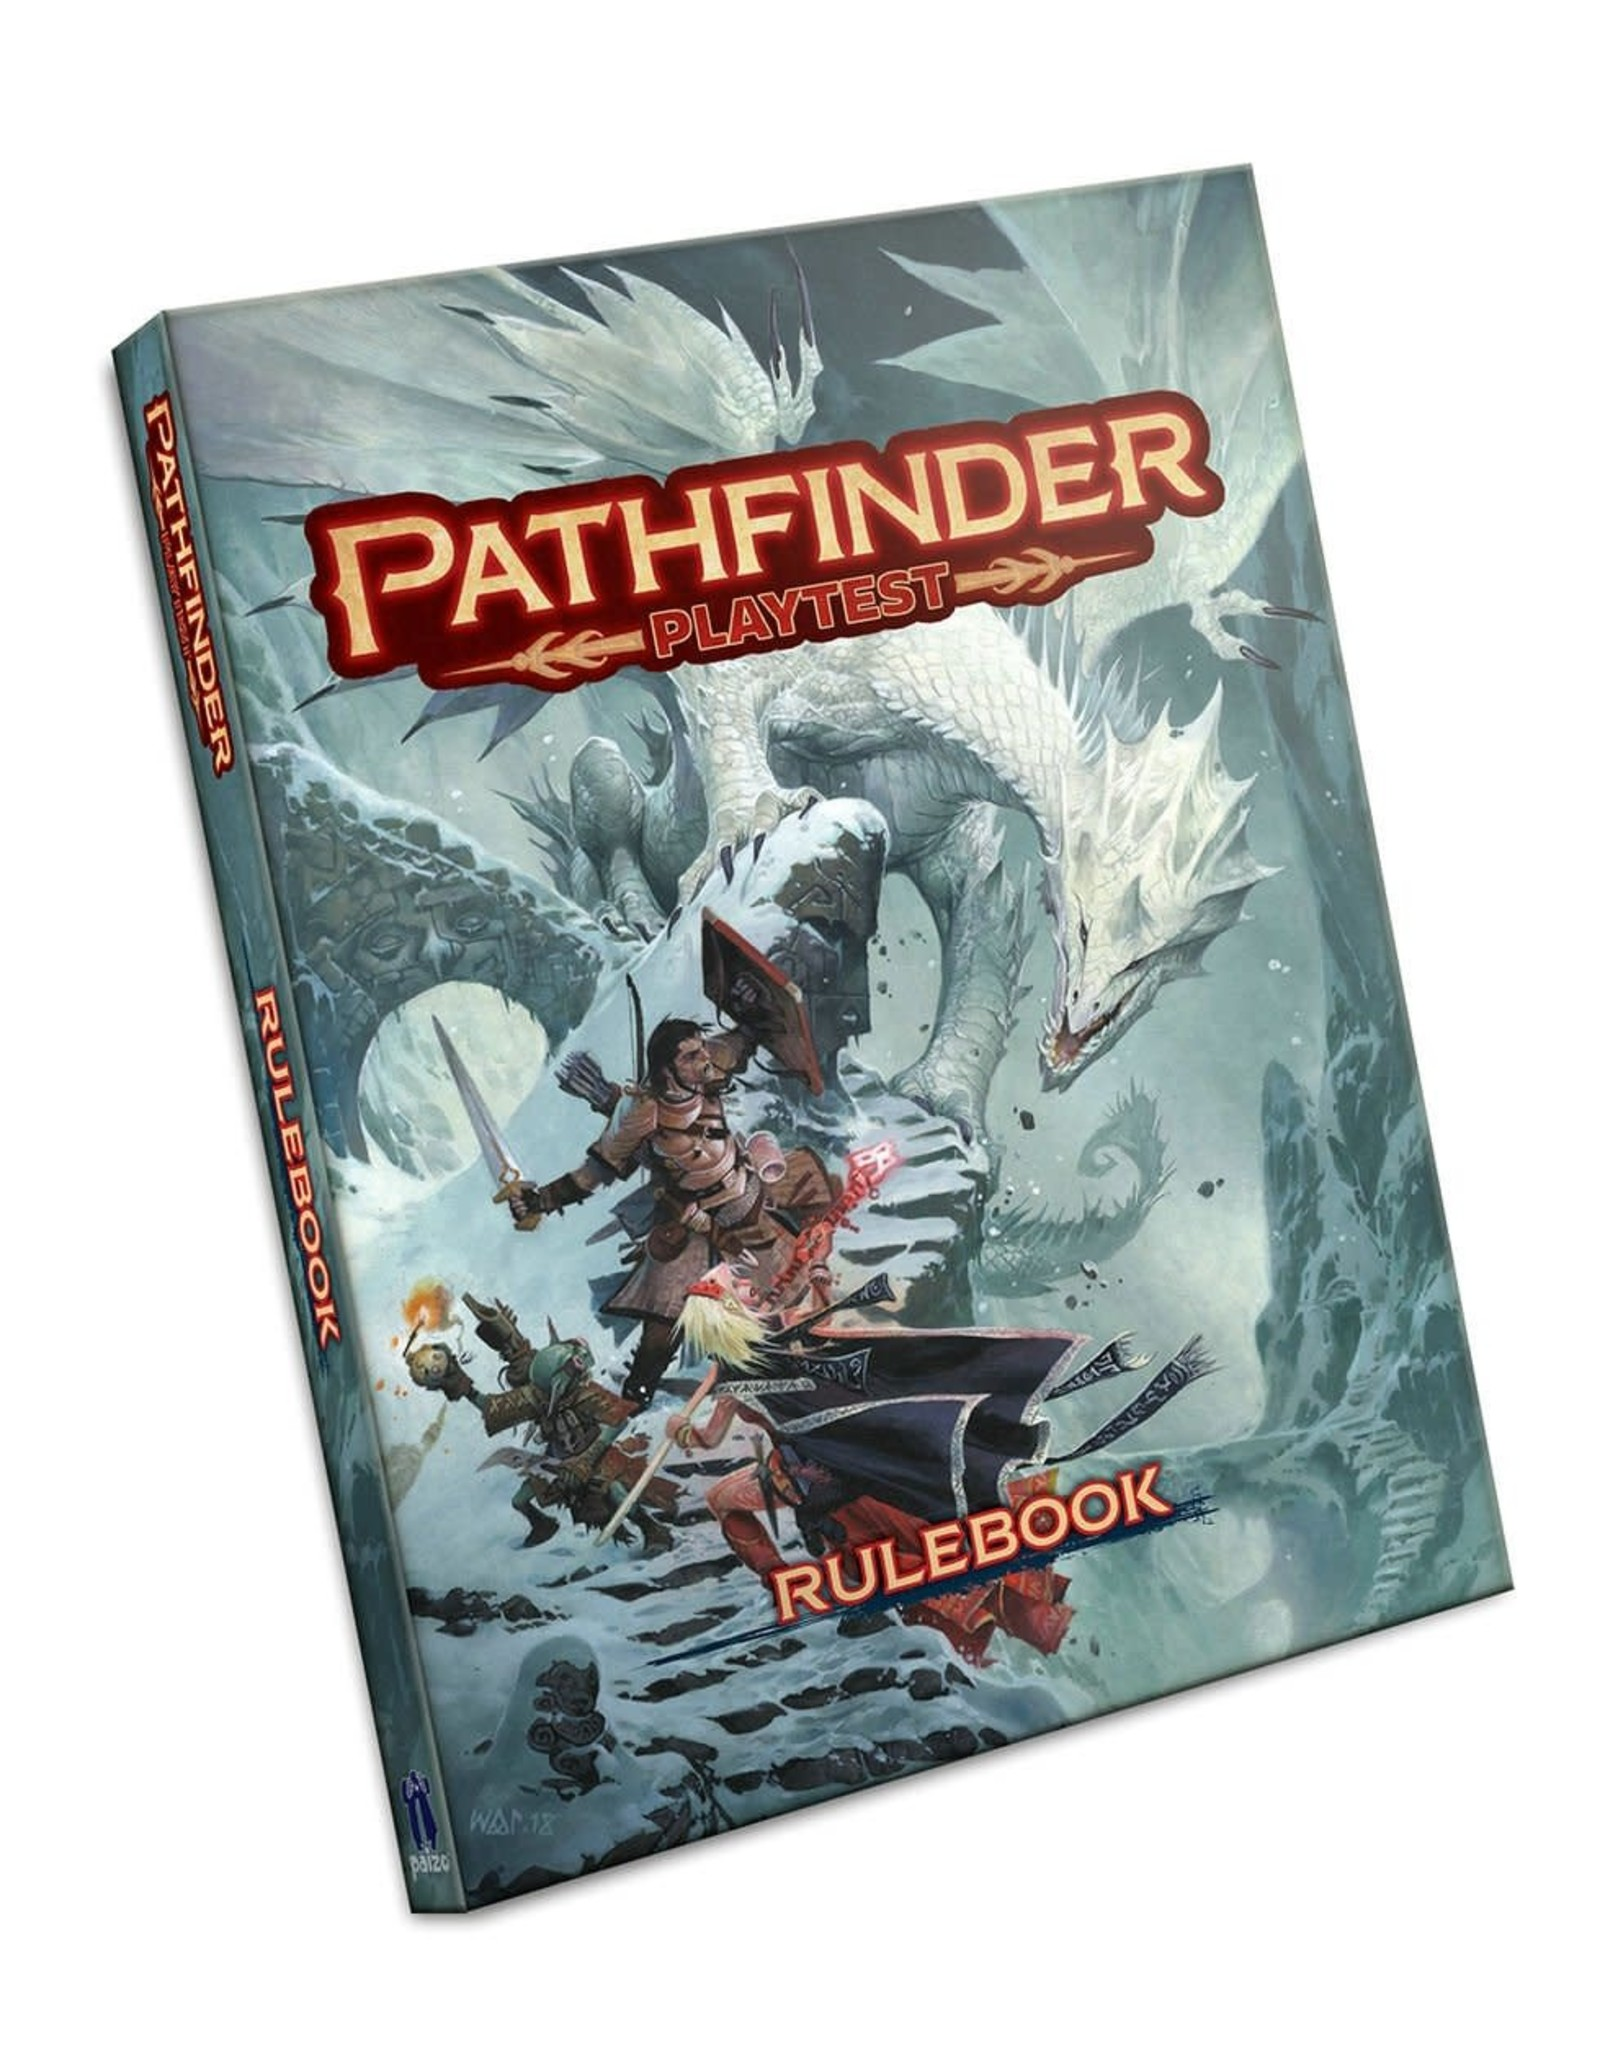 Pathfinder 2E Playtest Rulebook (Hardcover)